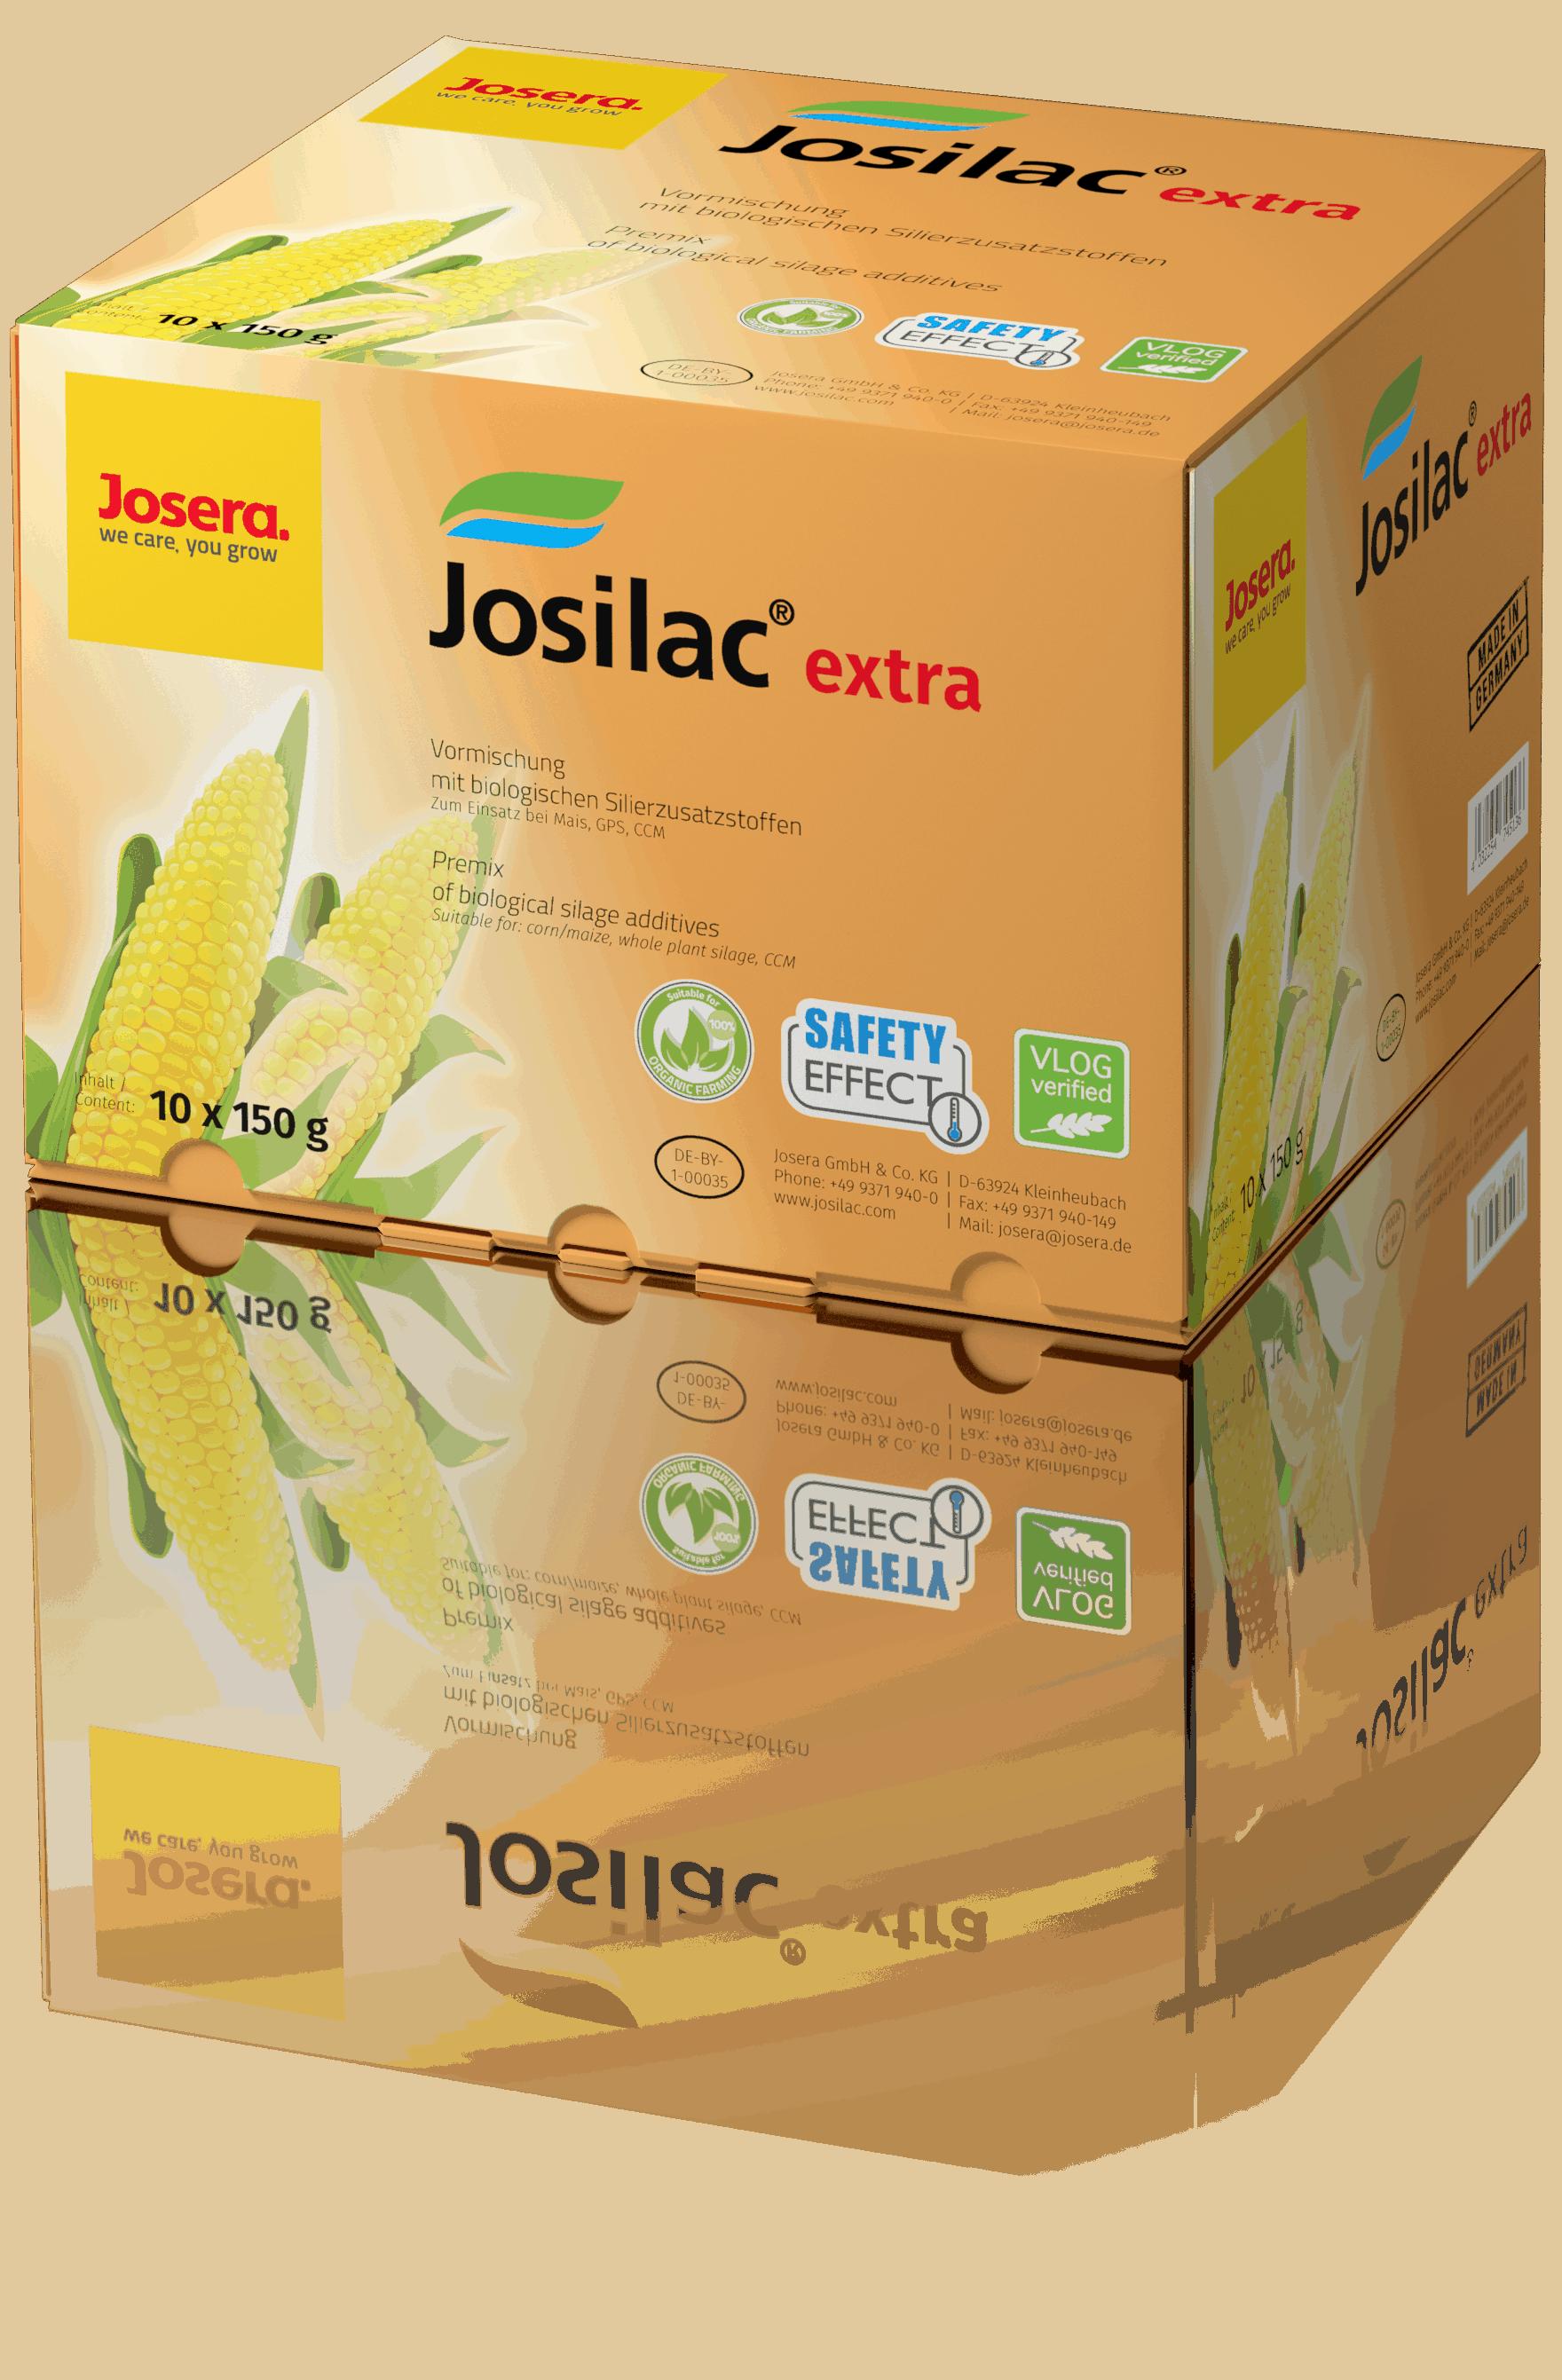 josilac extra, conservateur d'ensilage, carton